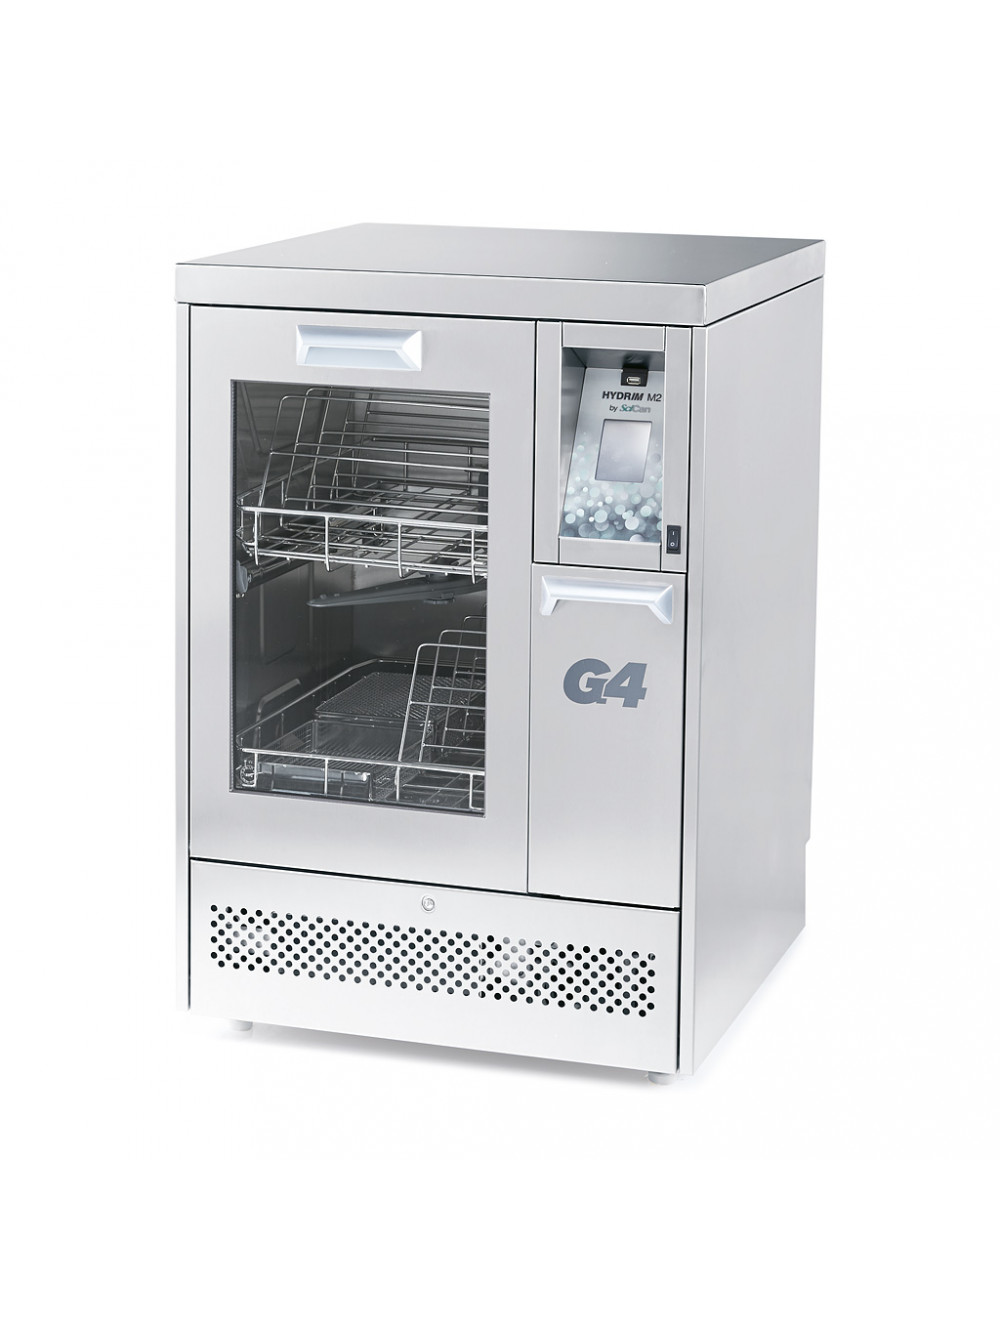 Das Produkt Scican Reinigungs- und Desinfektionsgerät HYDRIM M2, G4-Cloud M2WD-D02SH-G4, verschiedene Beladungsoptionen aus dem Global-dent online shop.